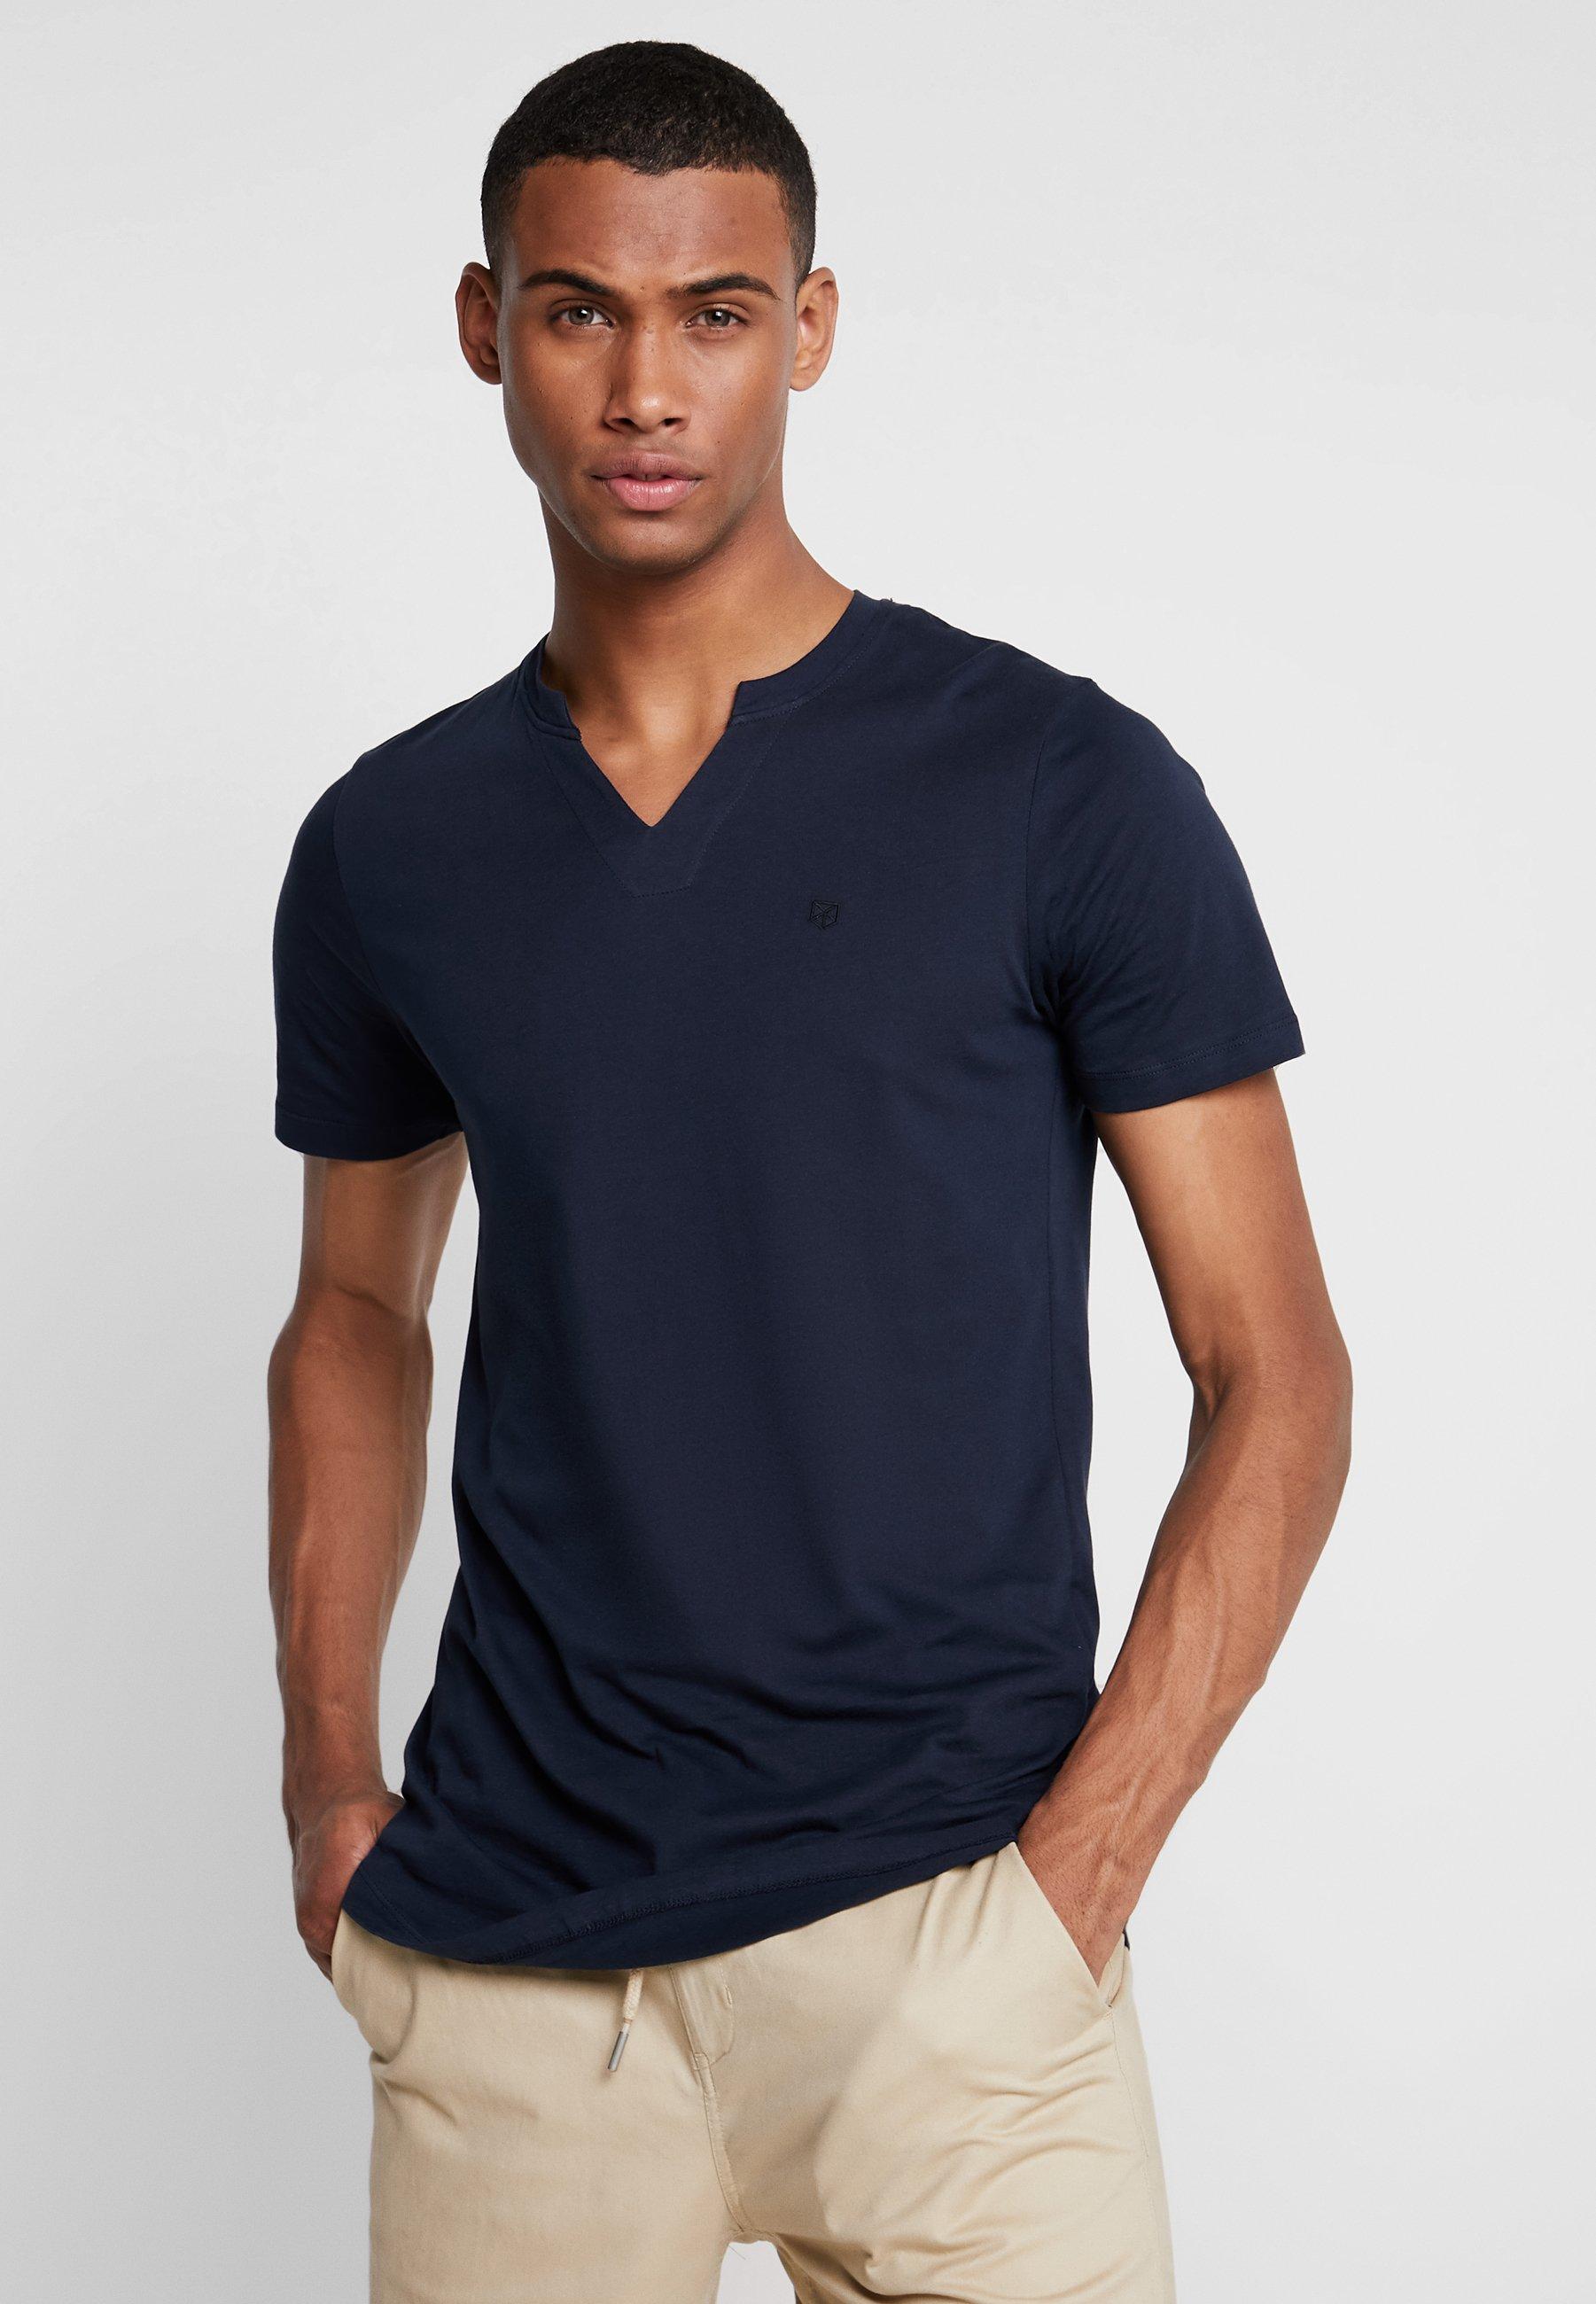 Blazer NeckT shirt Jones Jprmisa Crew Navy Basique Tee Jackamp; Premium xtCrsdhQ